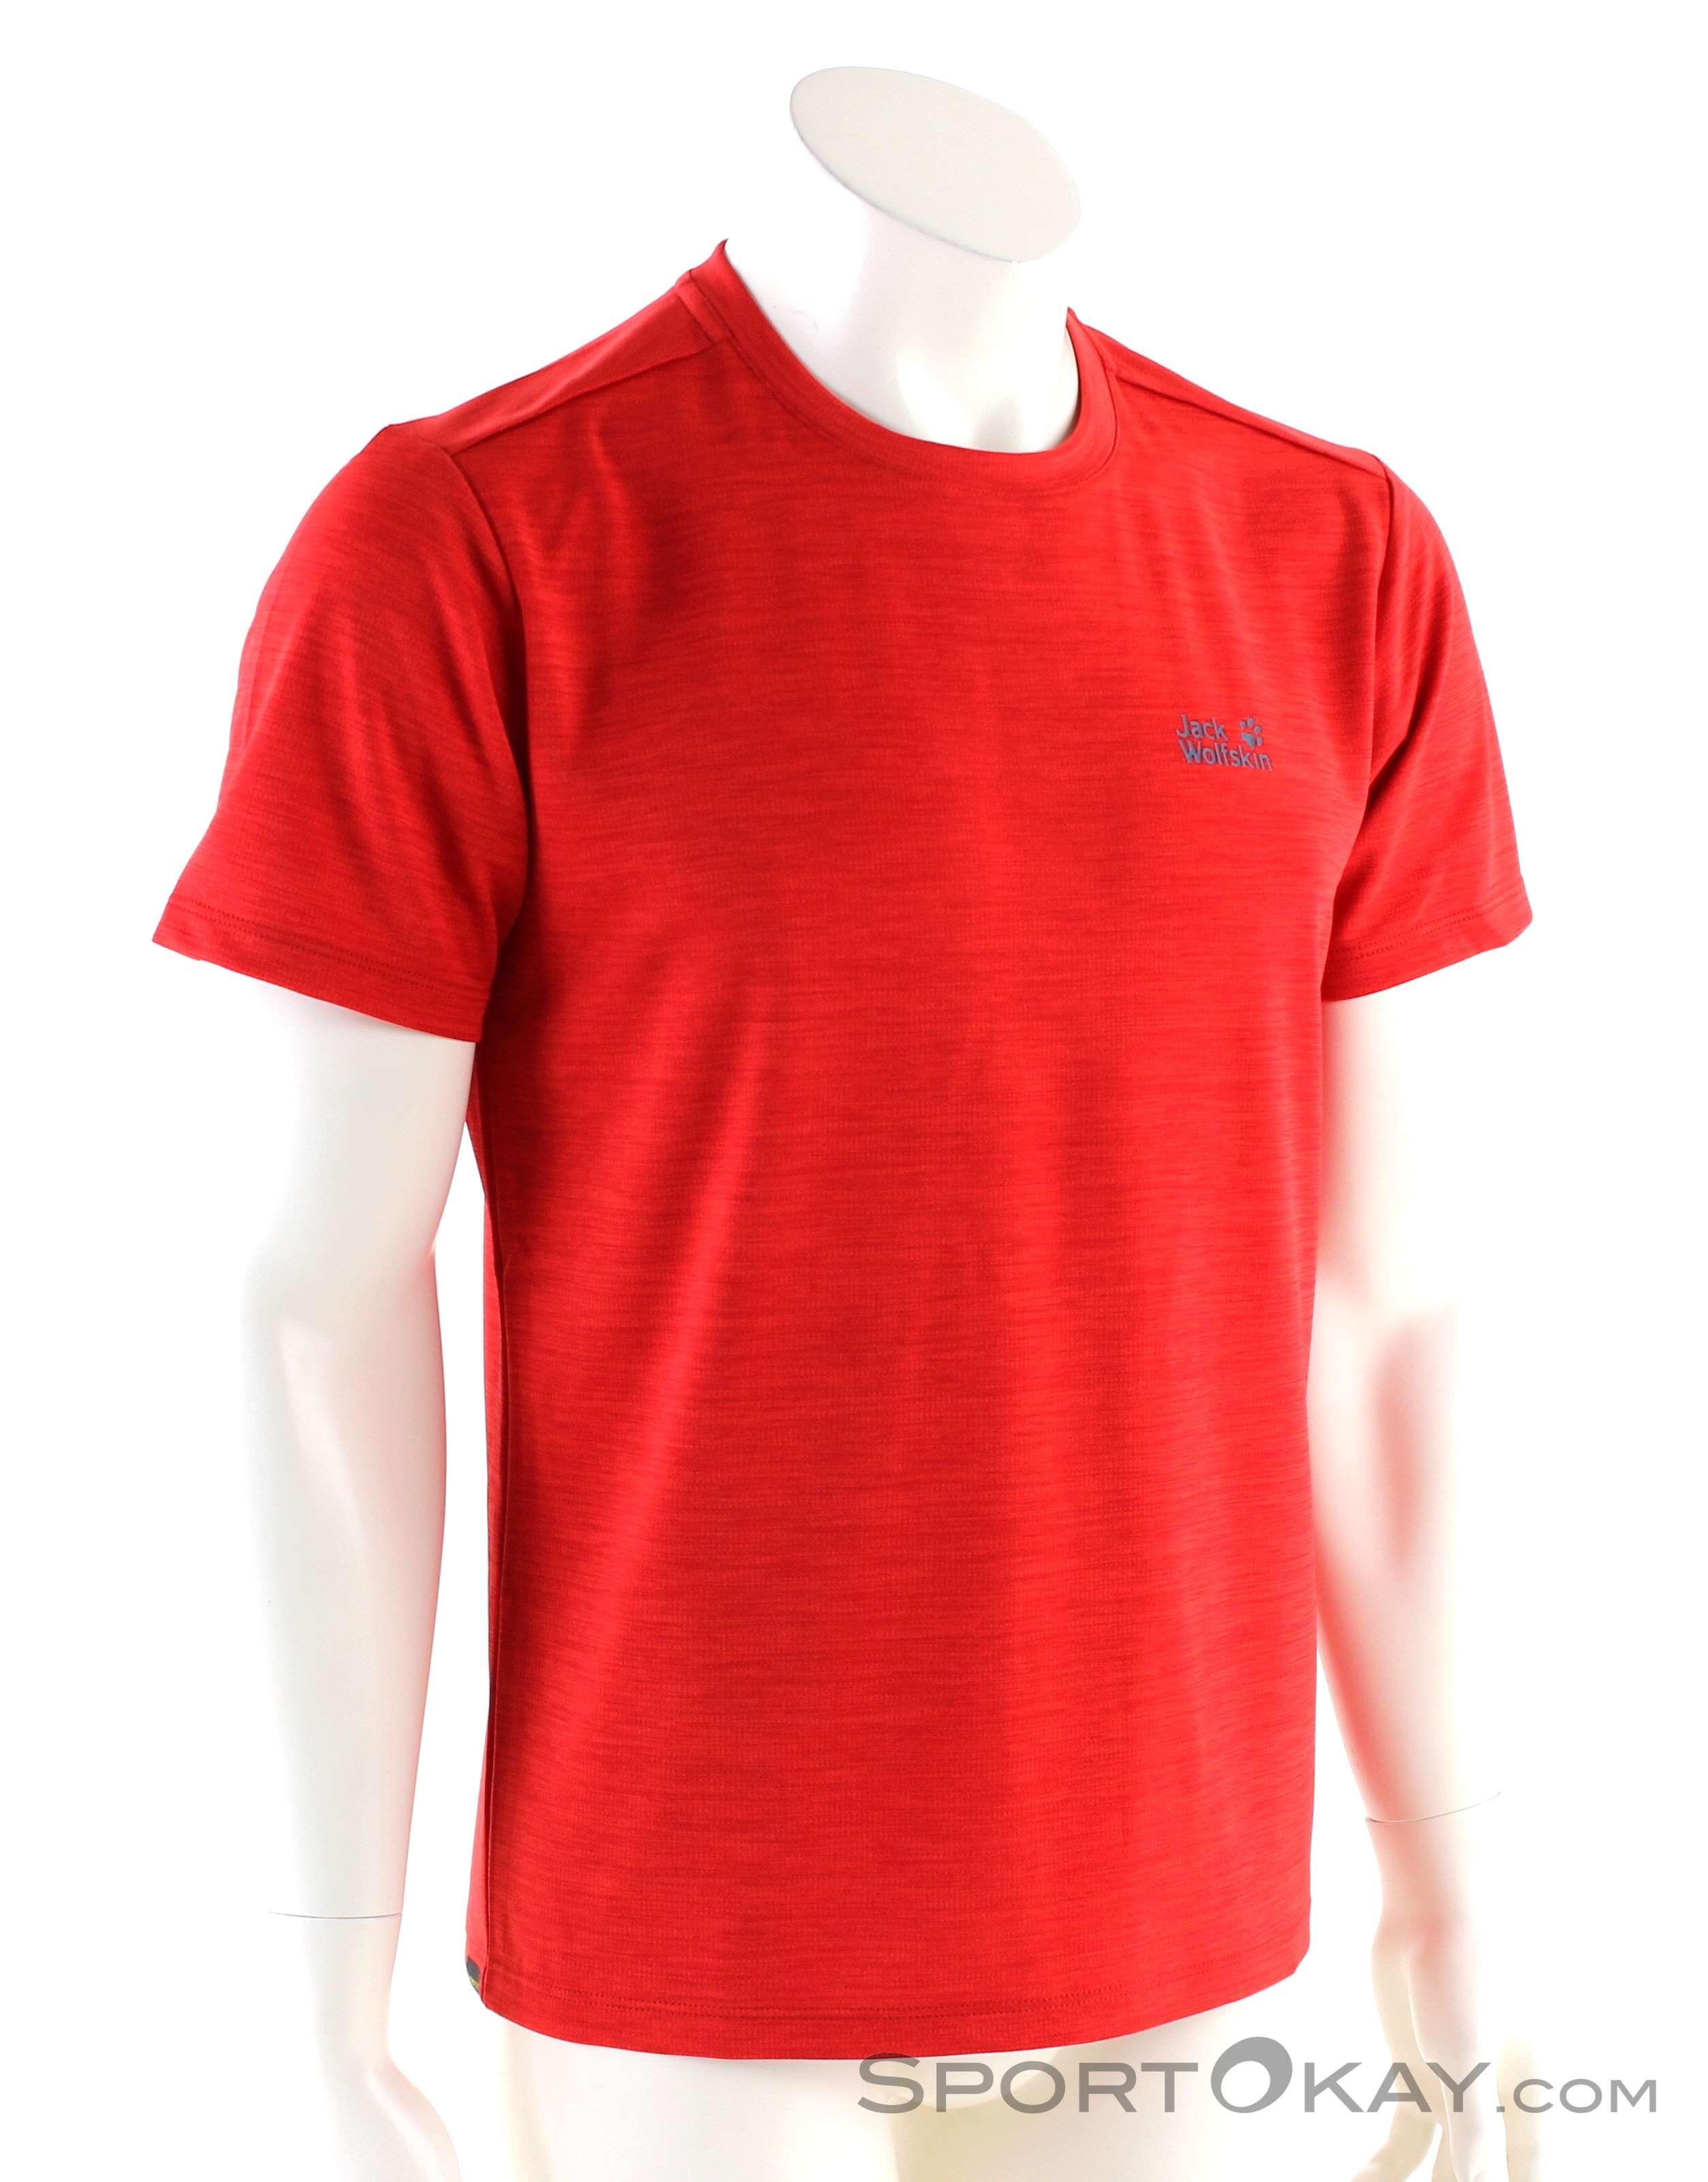 Jack Wolfskin Jack Wolfskin Hydropore XT Mens T Shirt